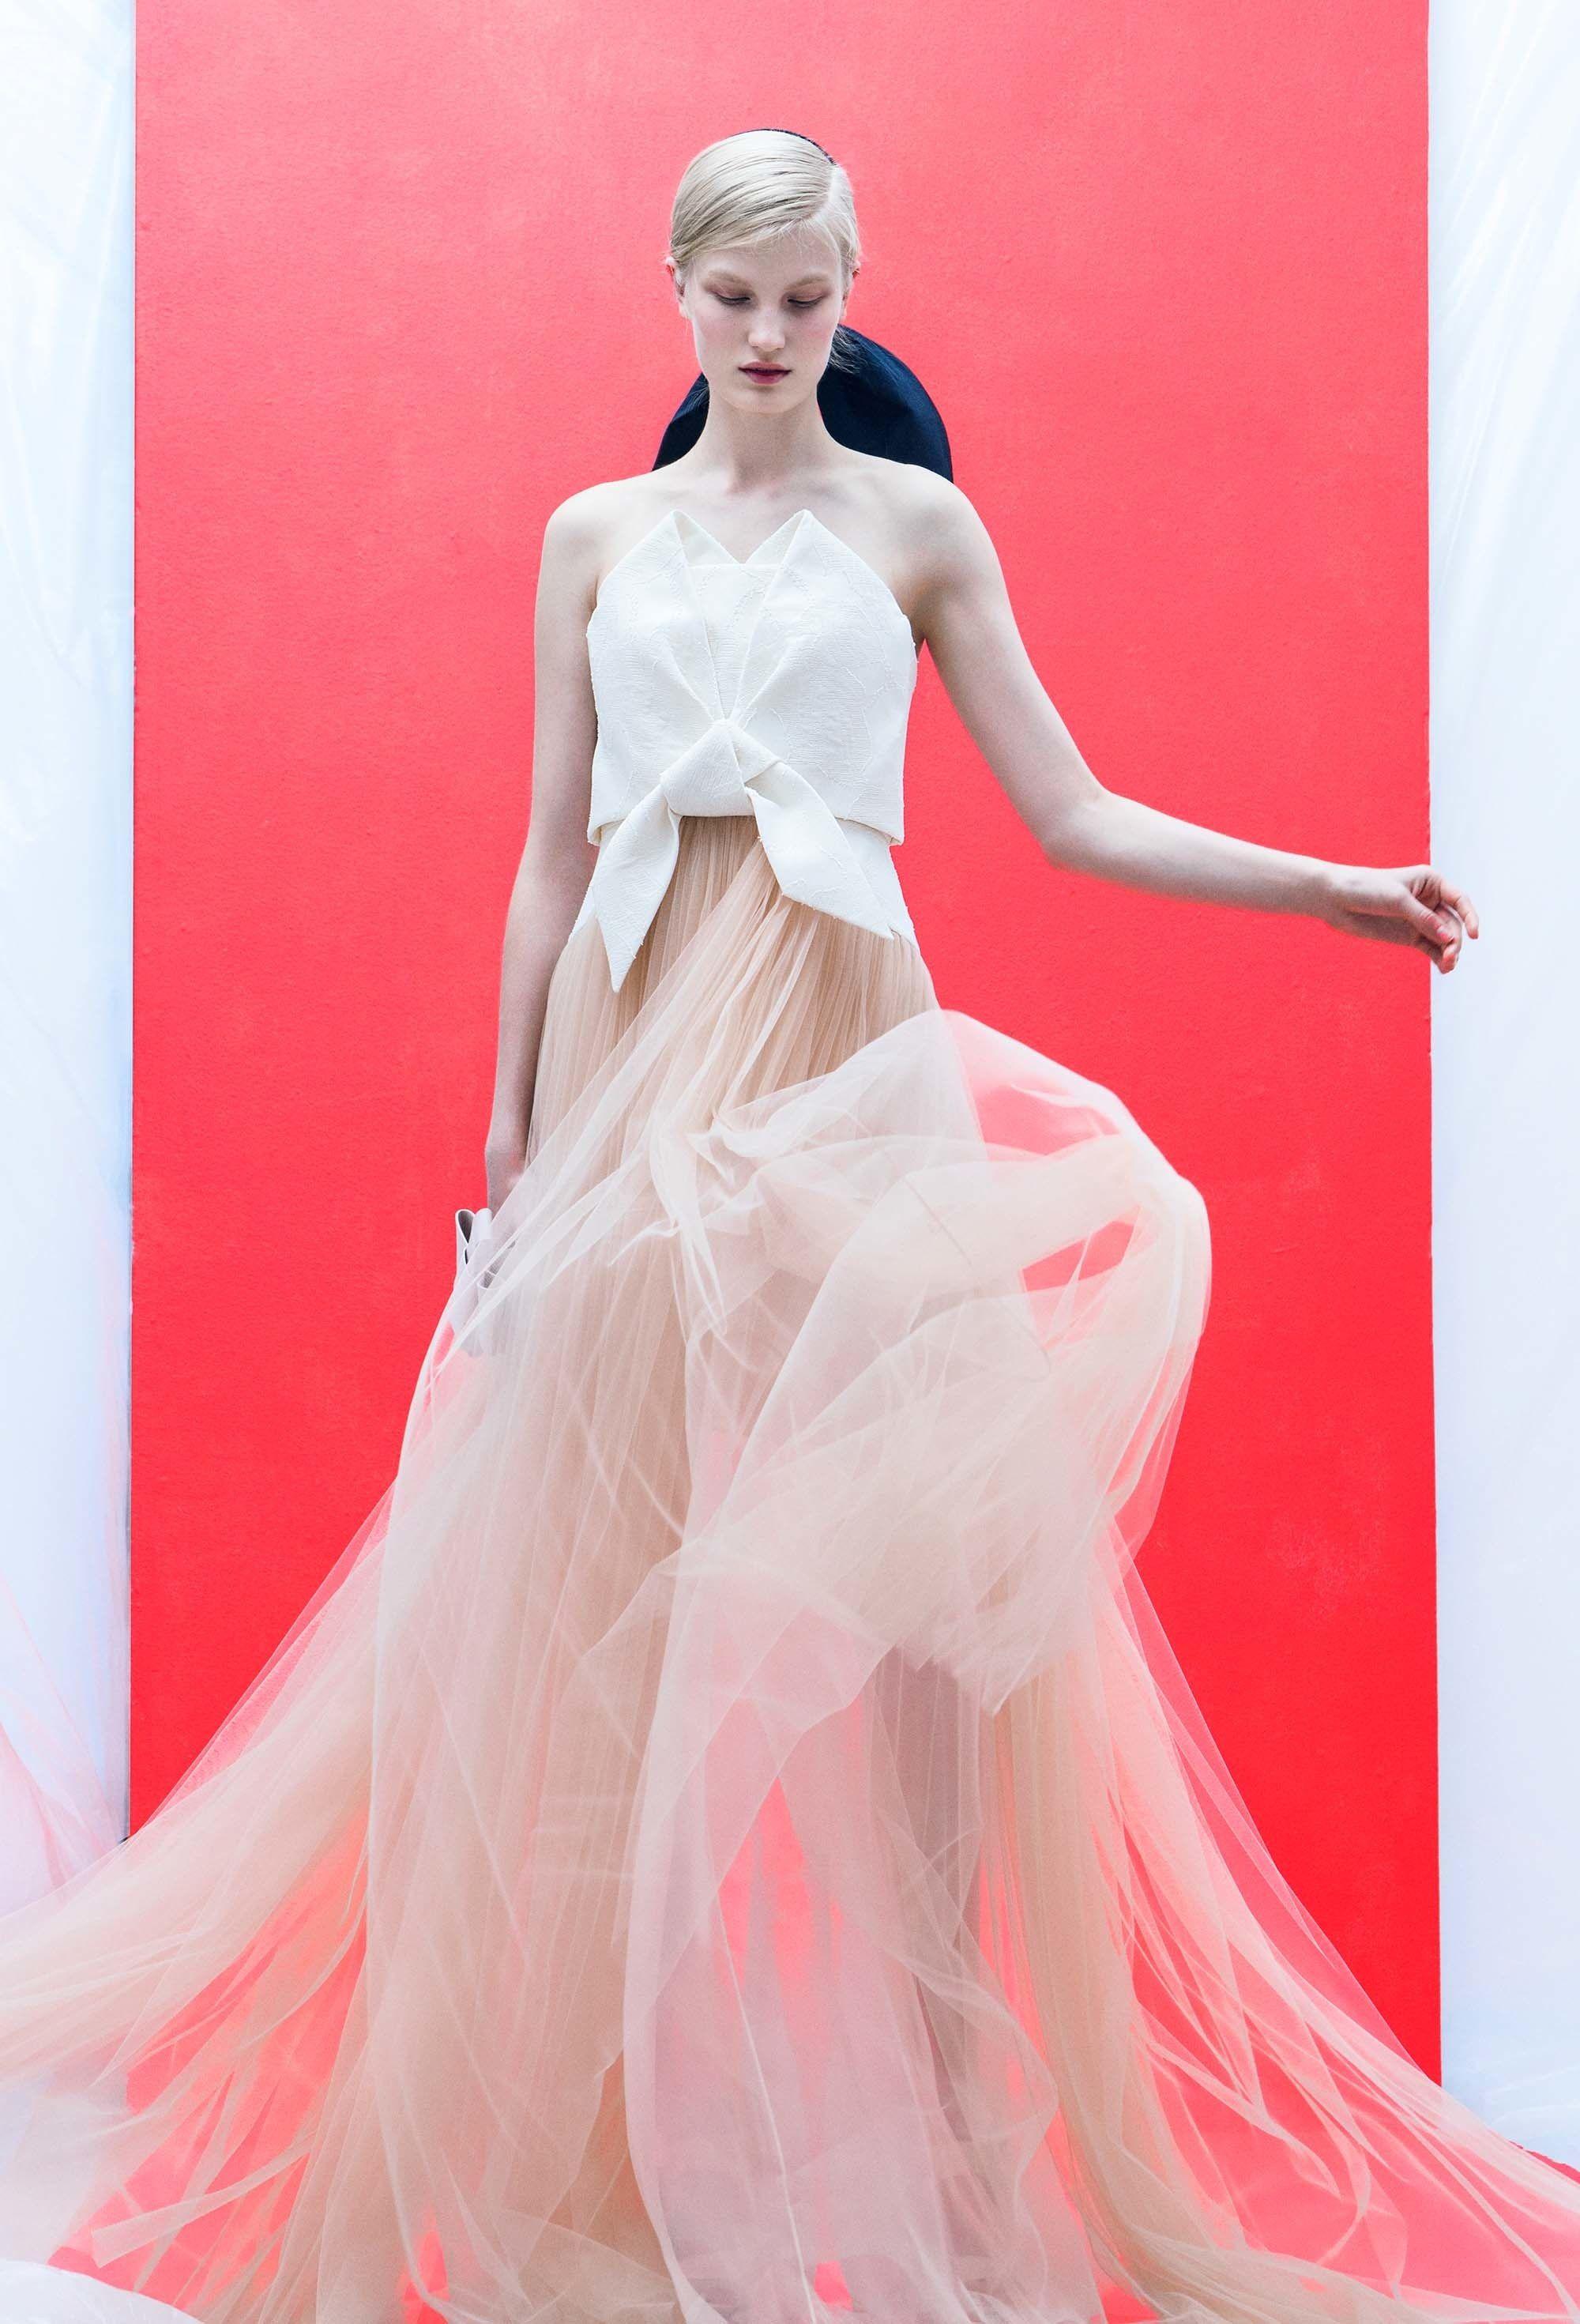 Delpozo Resort 2018 Fashion Show   El pozo, Foto retrato y Caprichosa